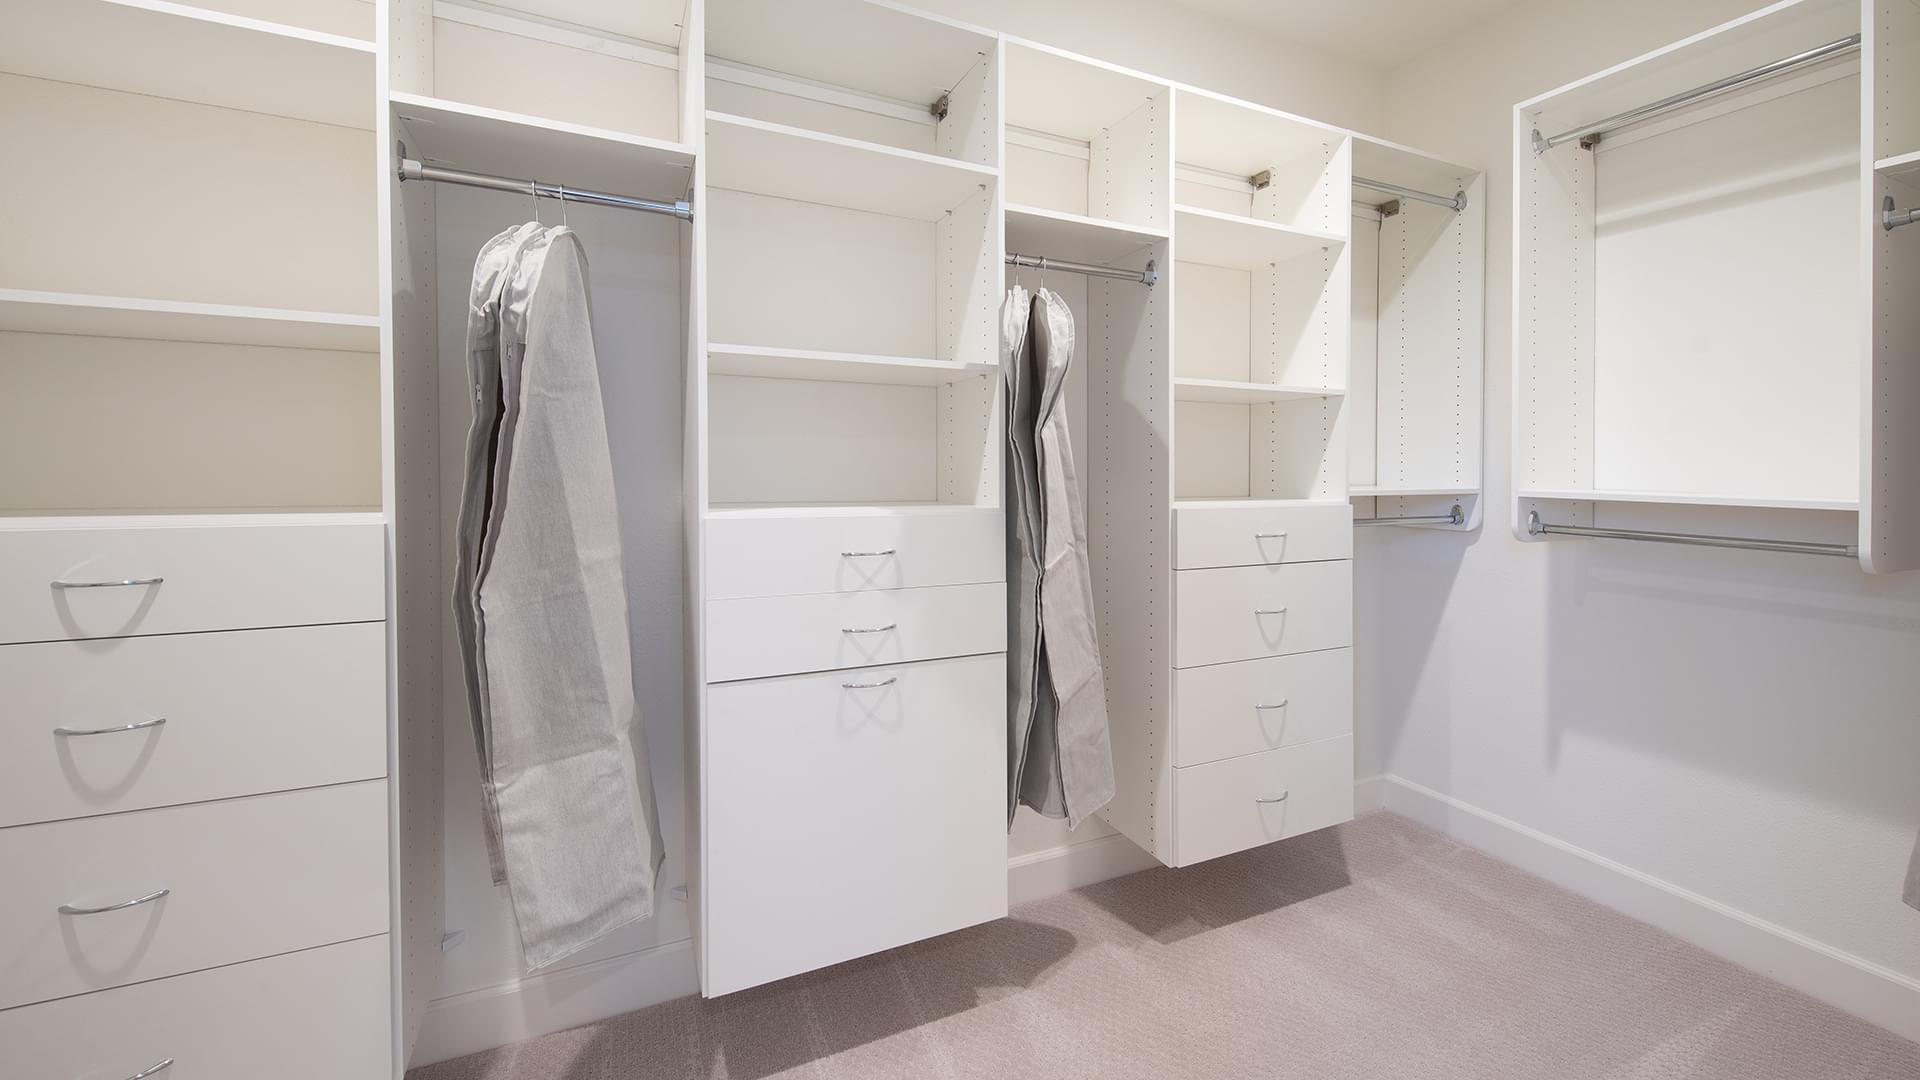 Residence 5 Master Walk-In Closet